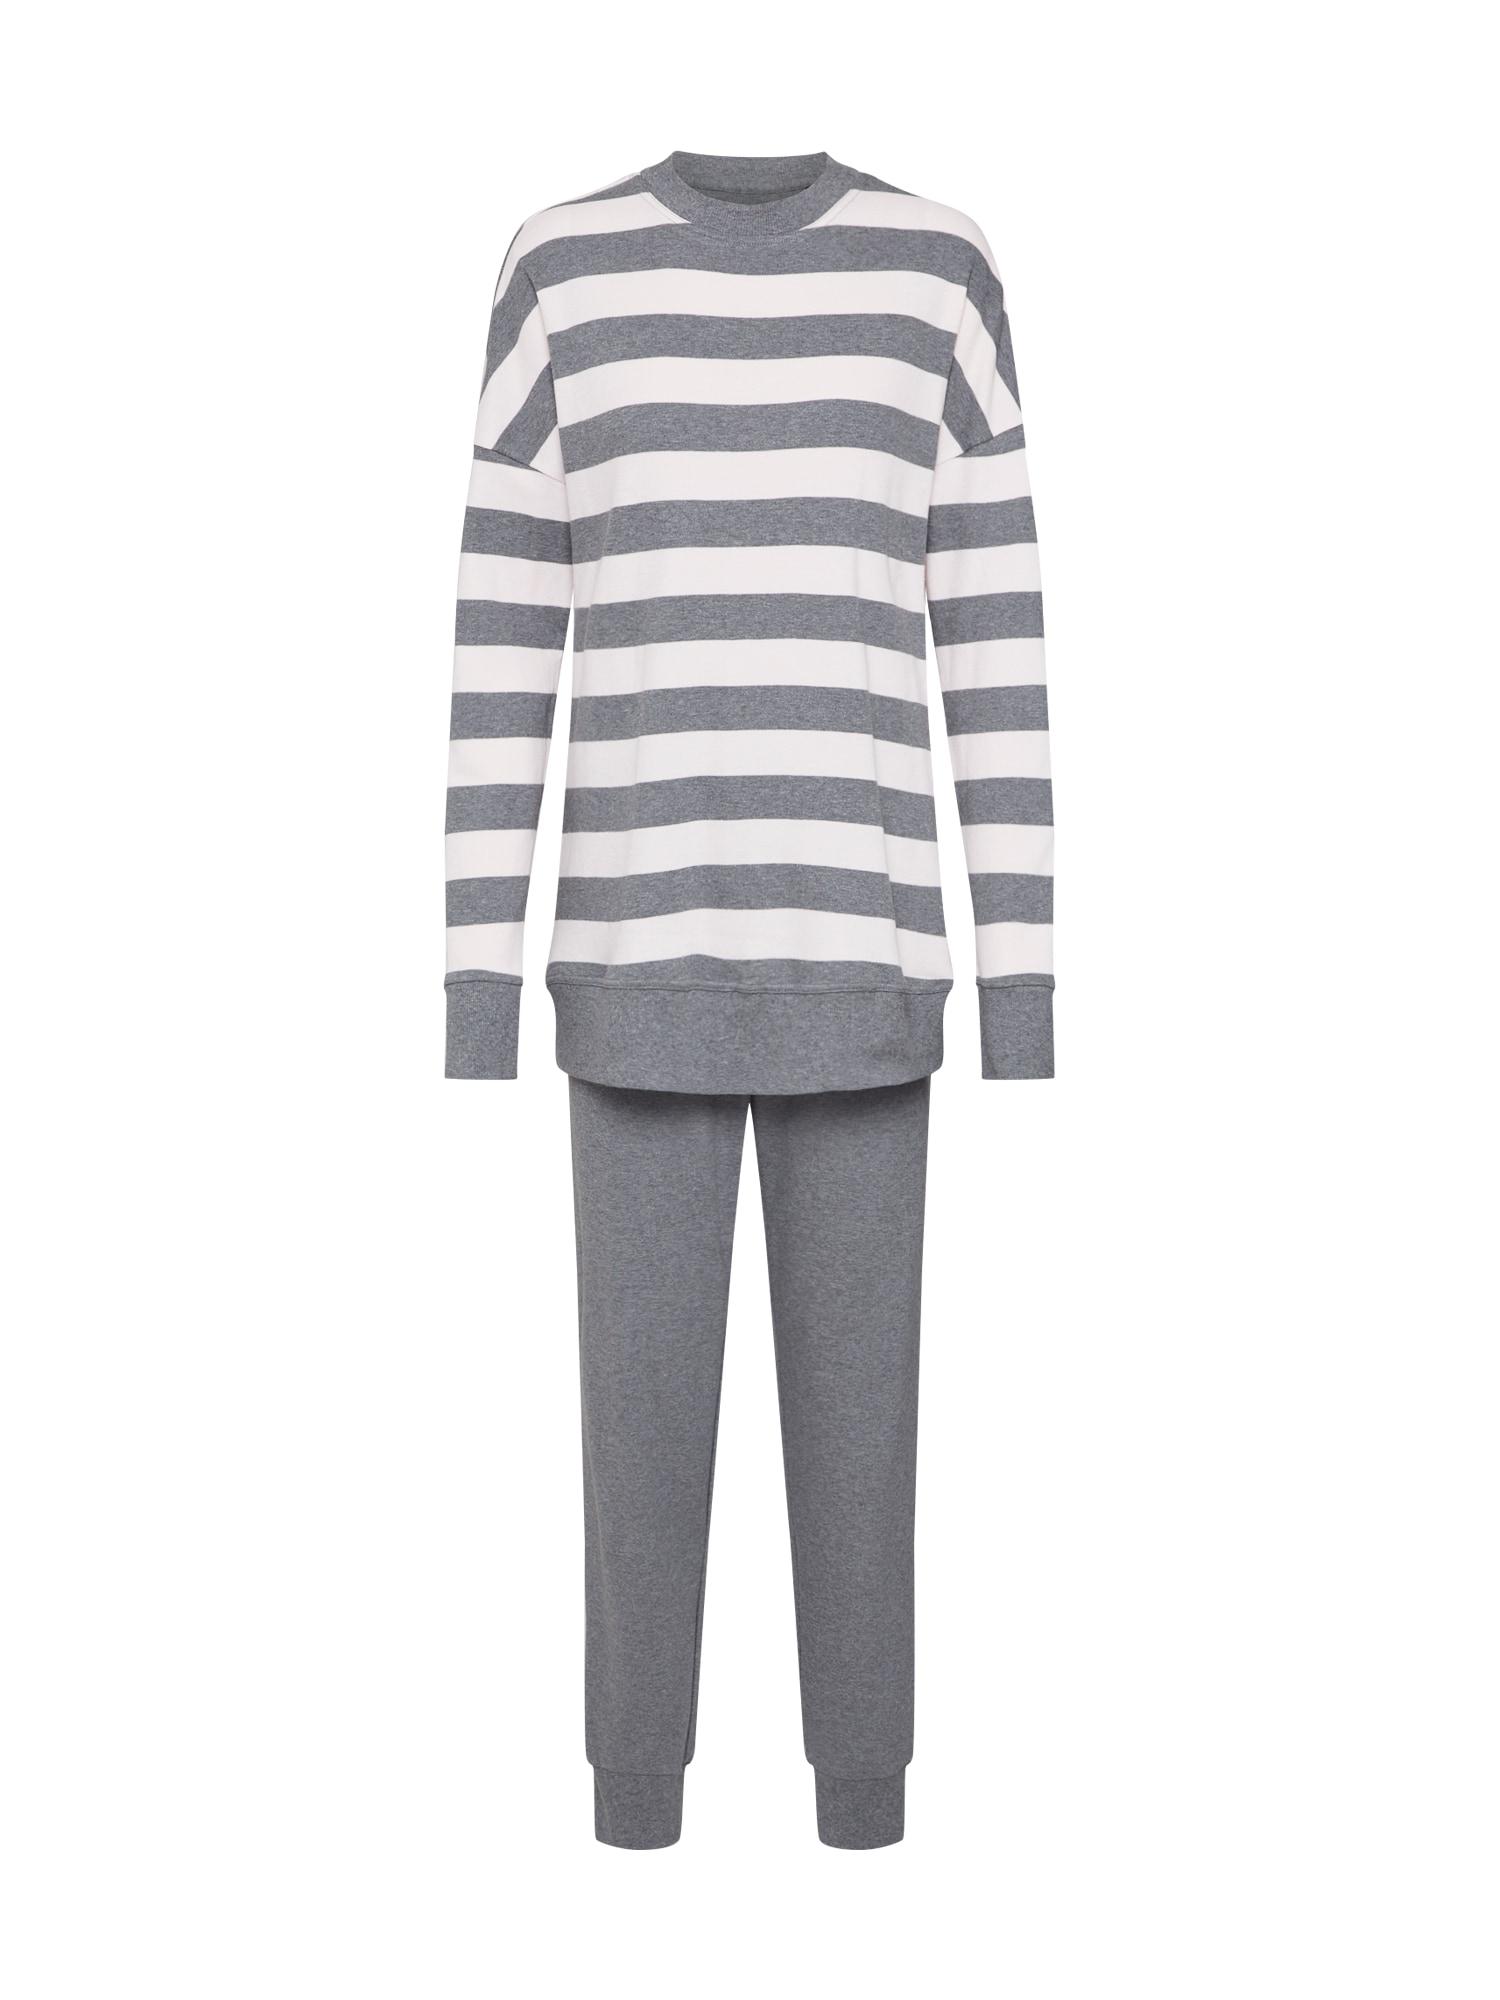 SCHIESSER Pižama tamsiai pilka / balta